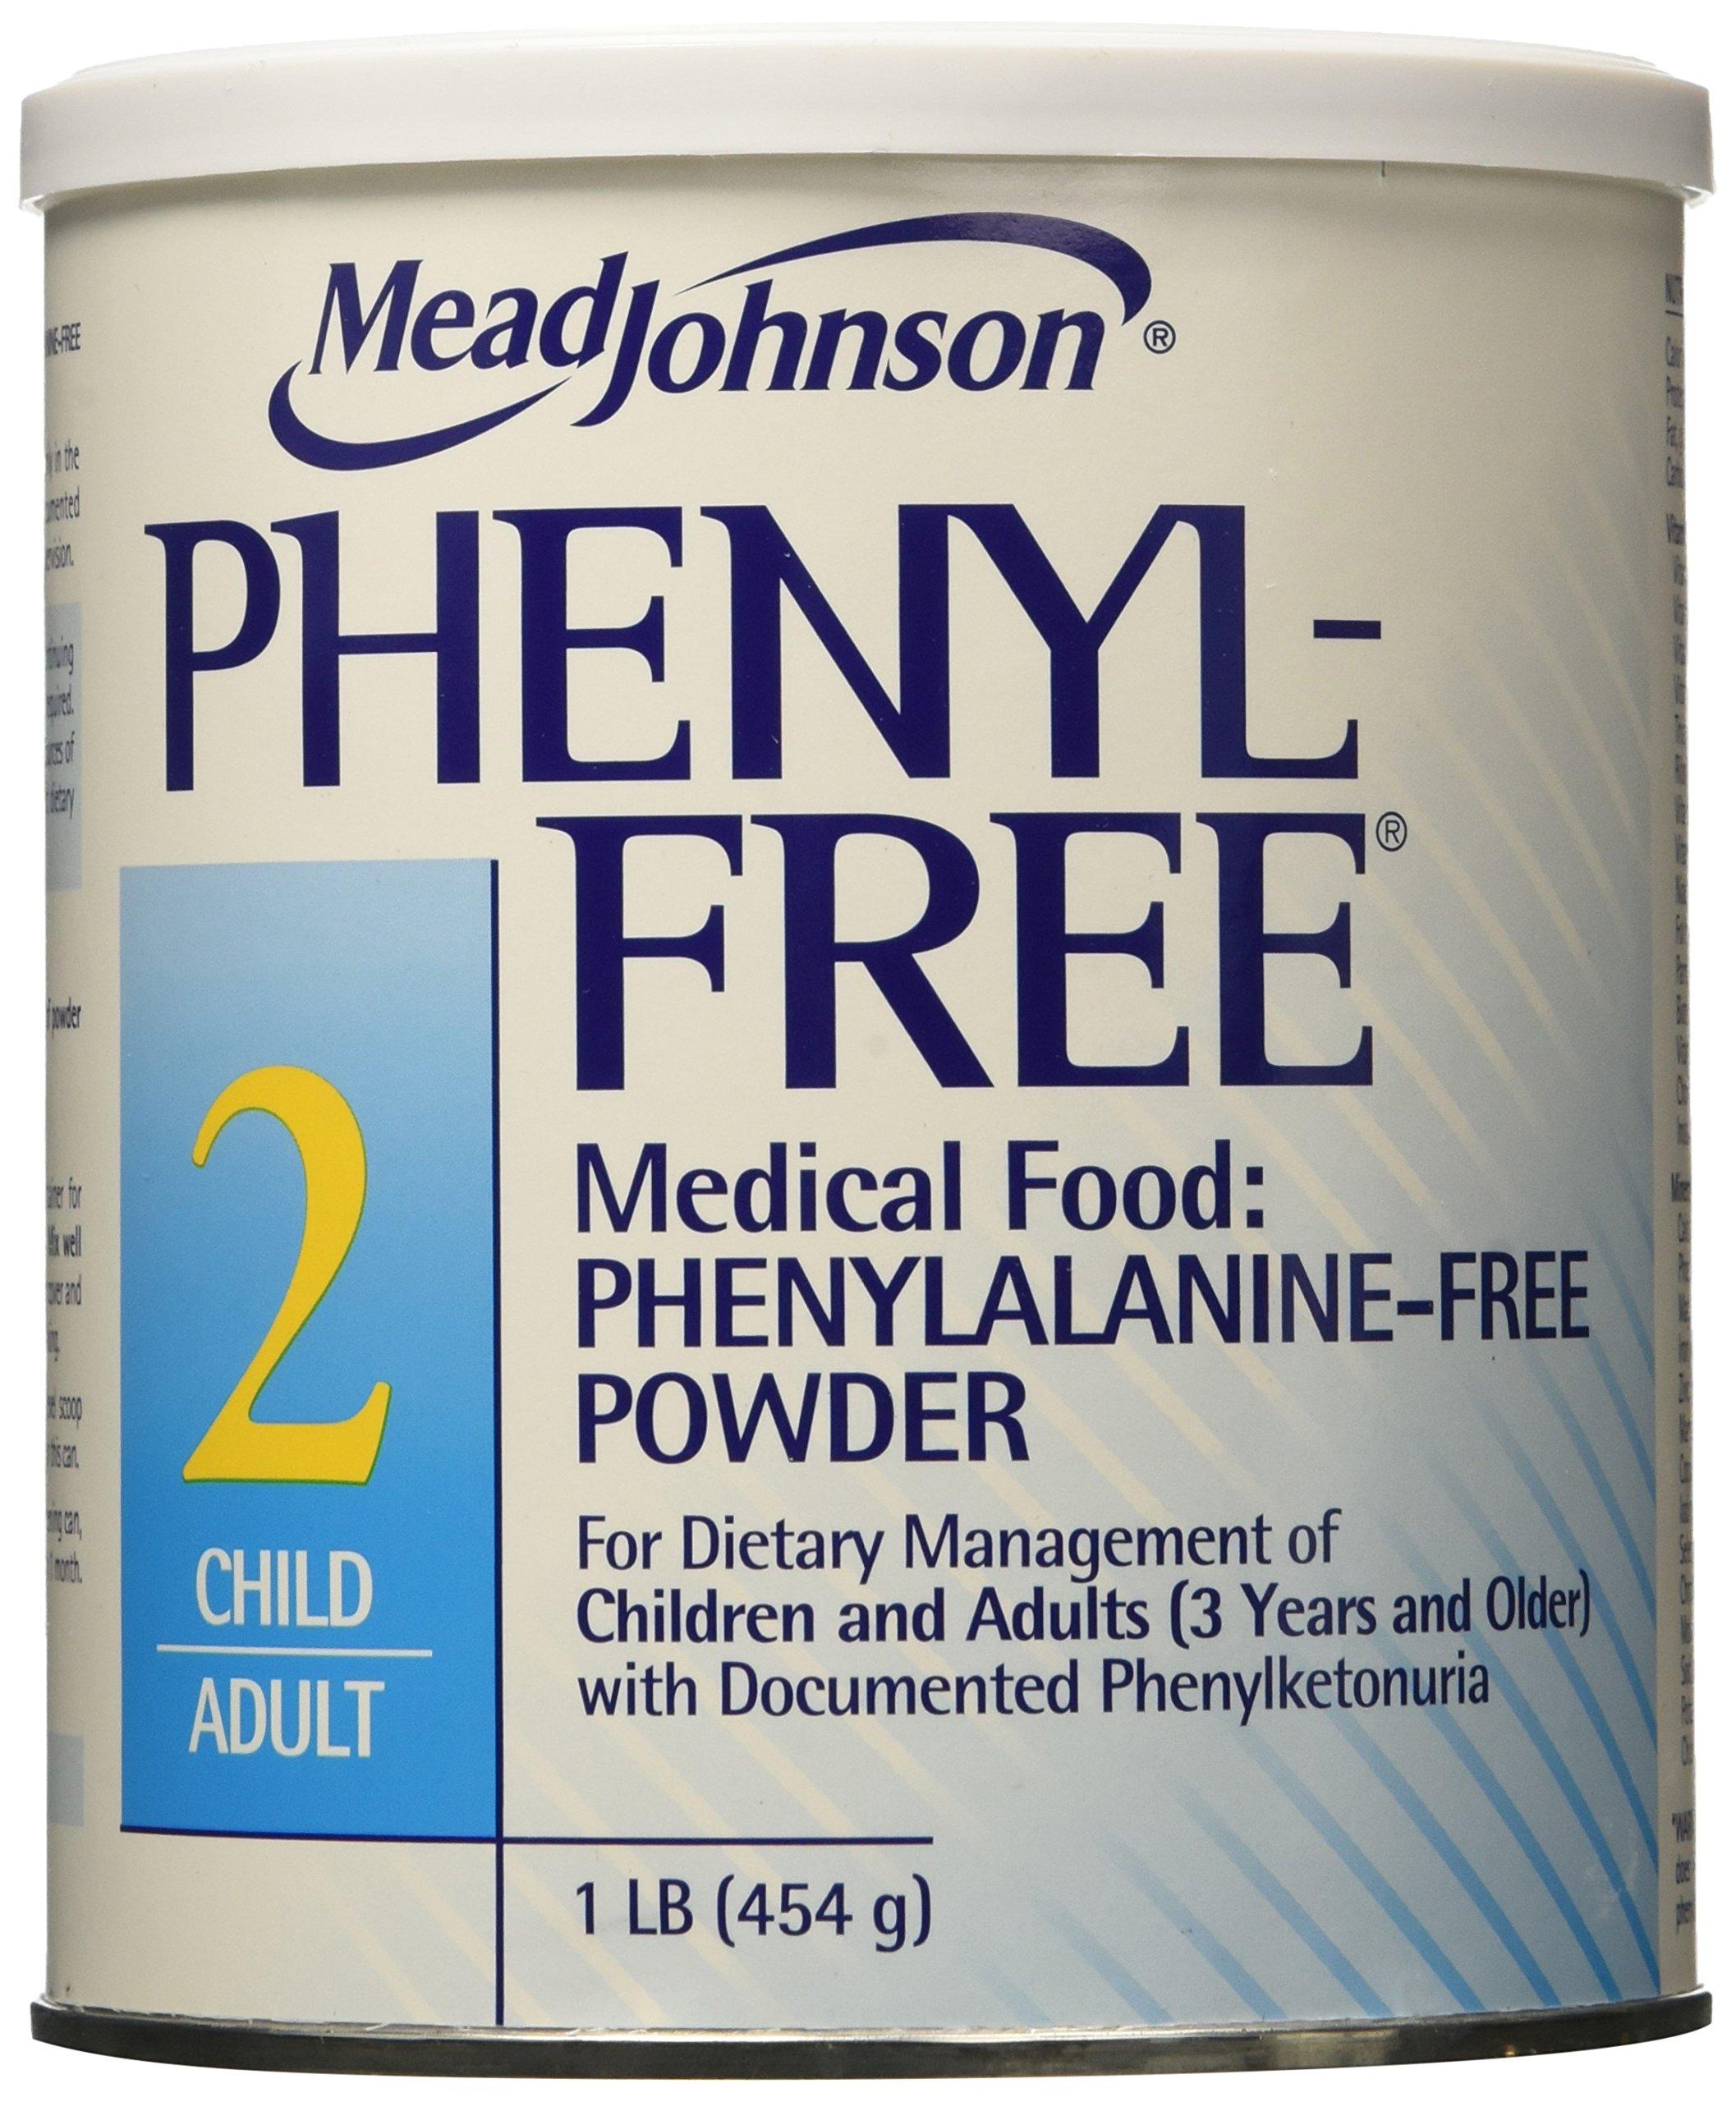 PHENYL-FREE 2 POWDER (6) Size: 1 LB